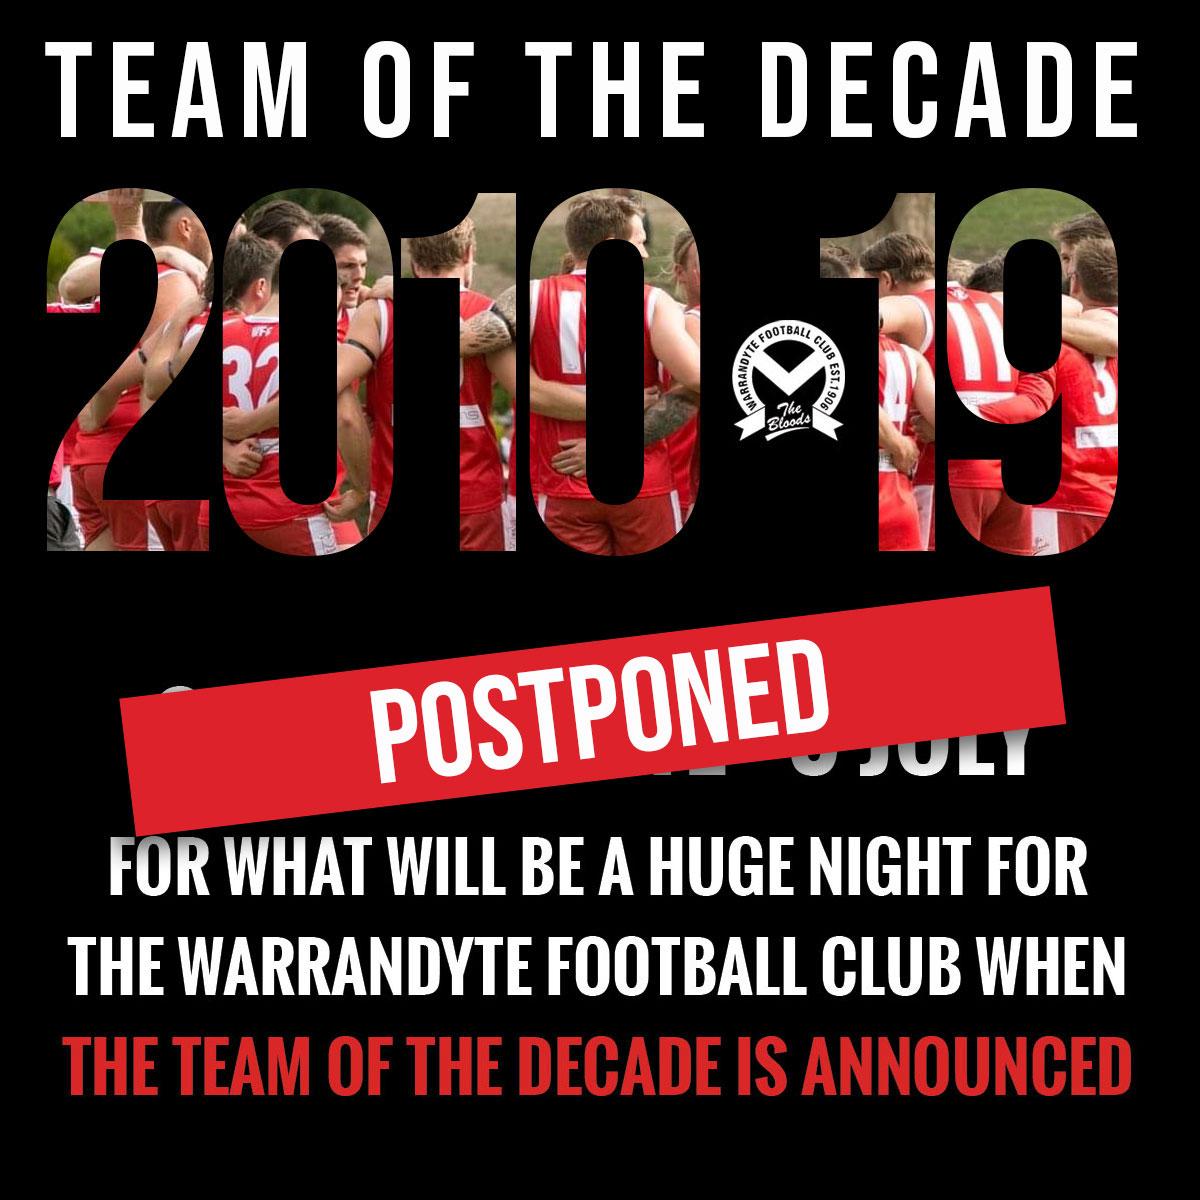 team of the decade postponed